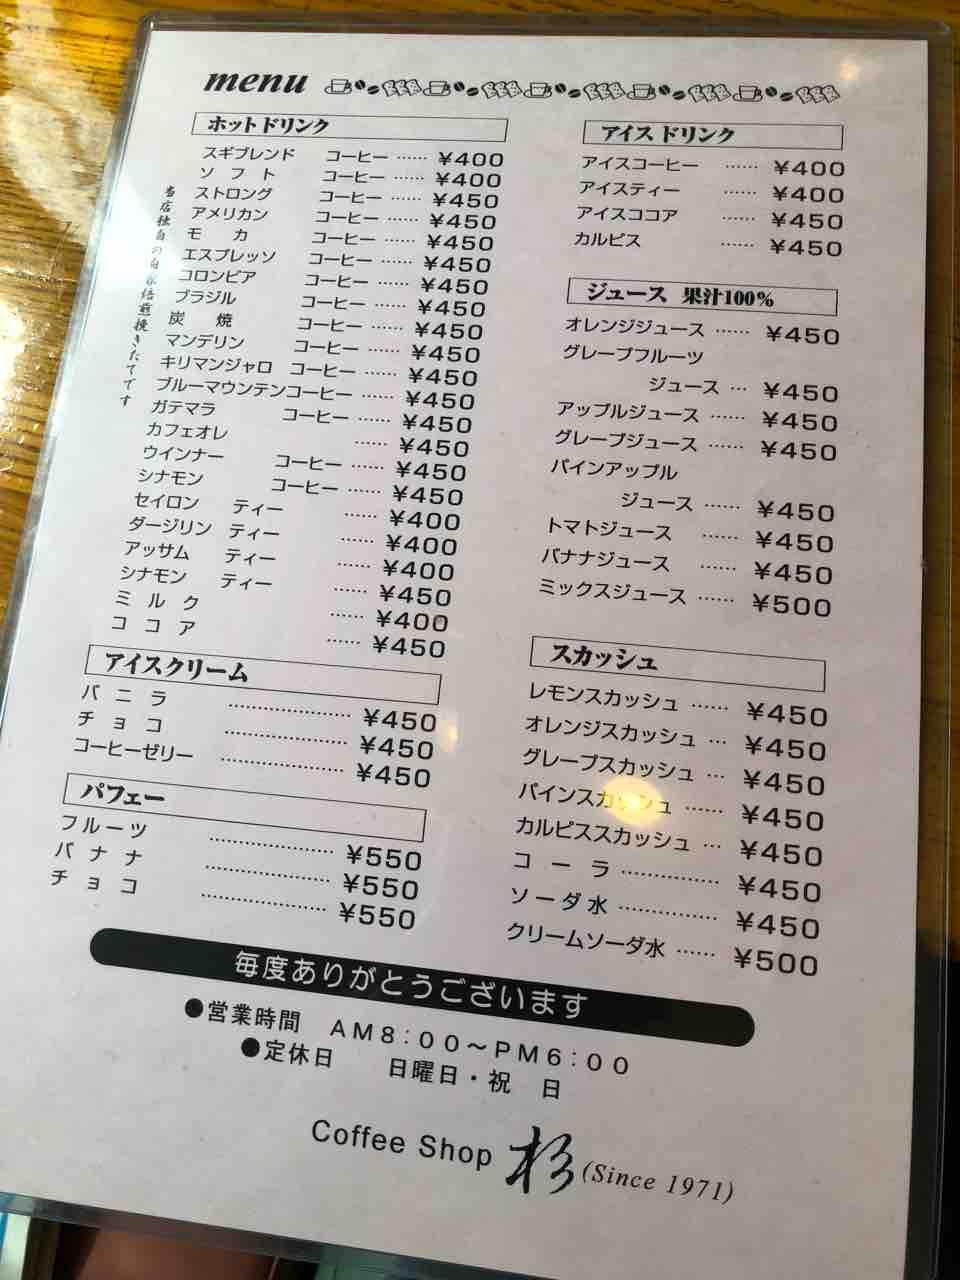 『Coffee Shop 杉』メニュー